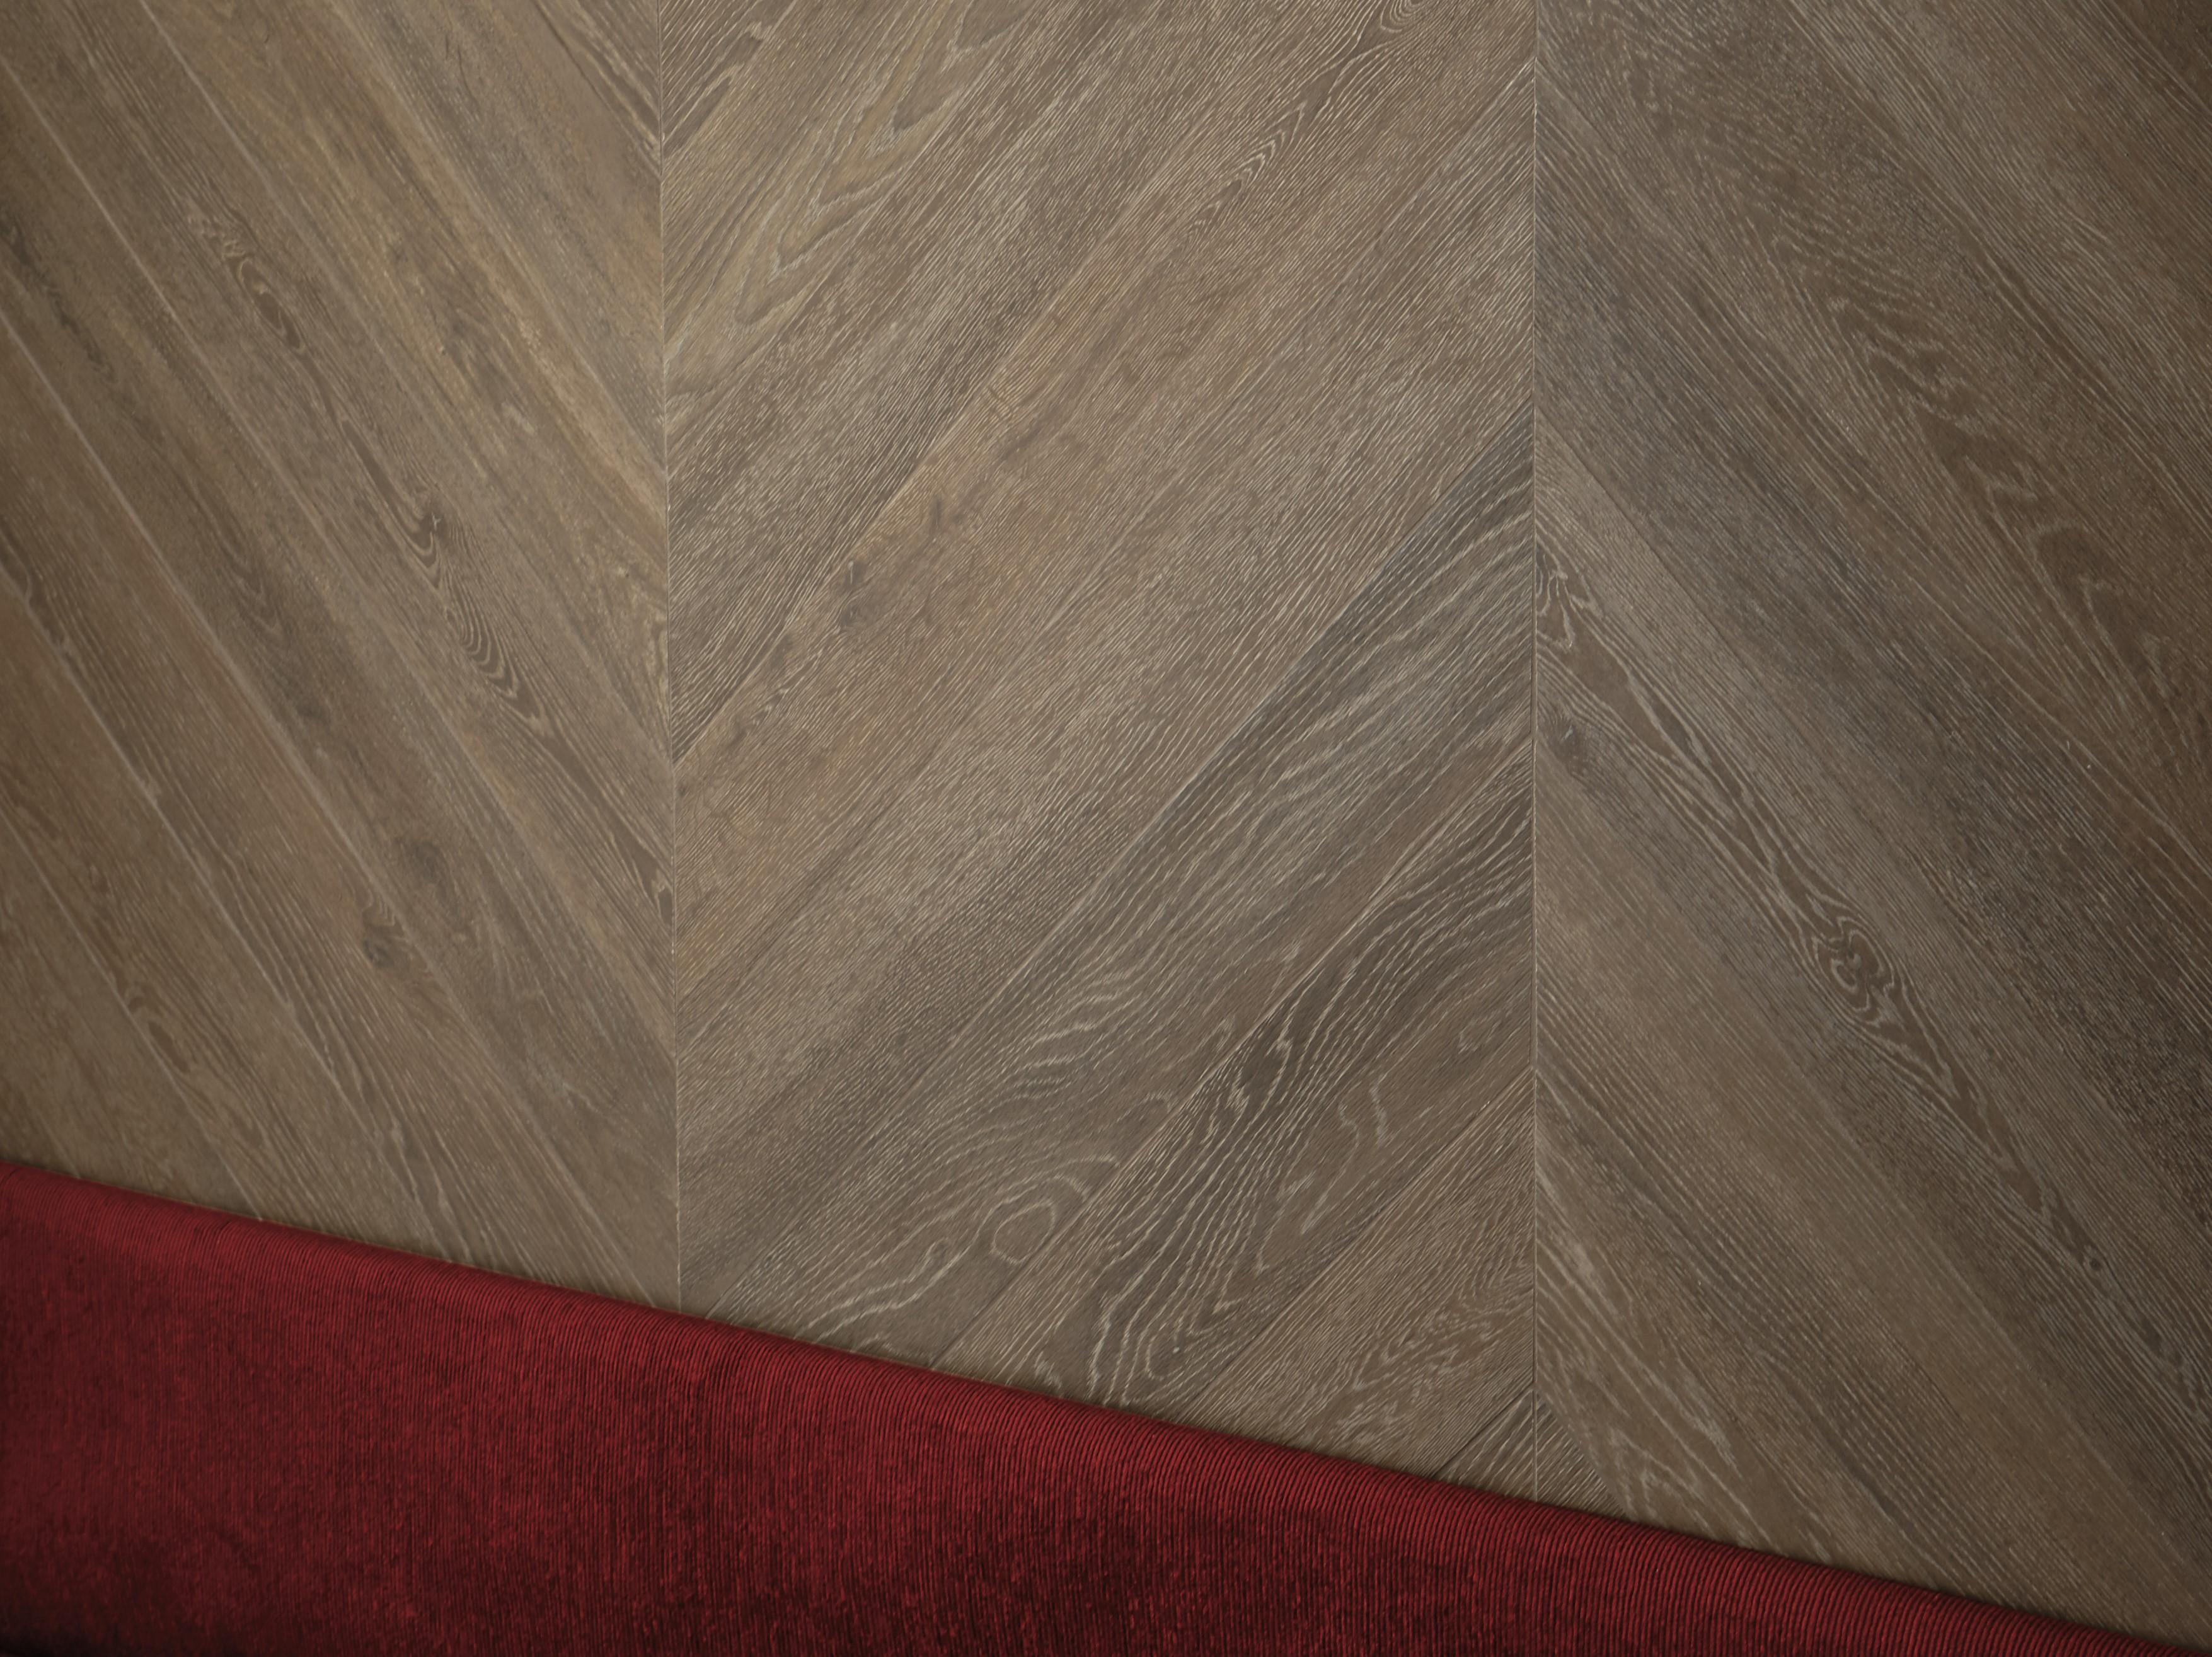 Tile backsplash in Jacksonville, FL from About Floors n More